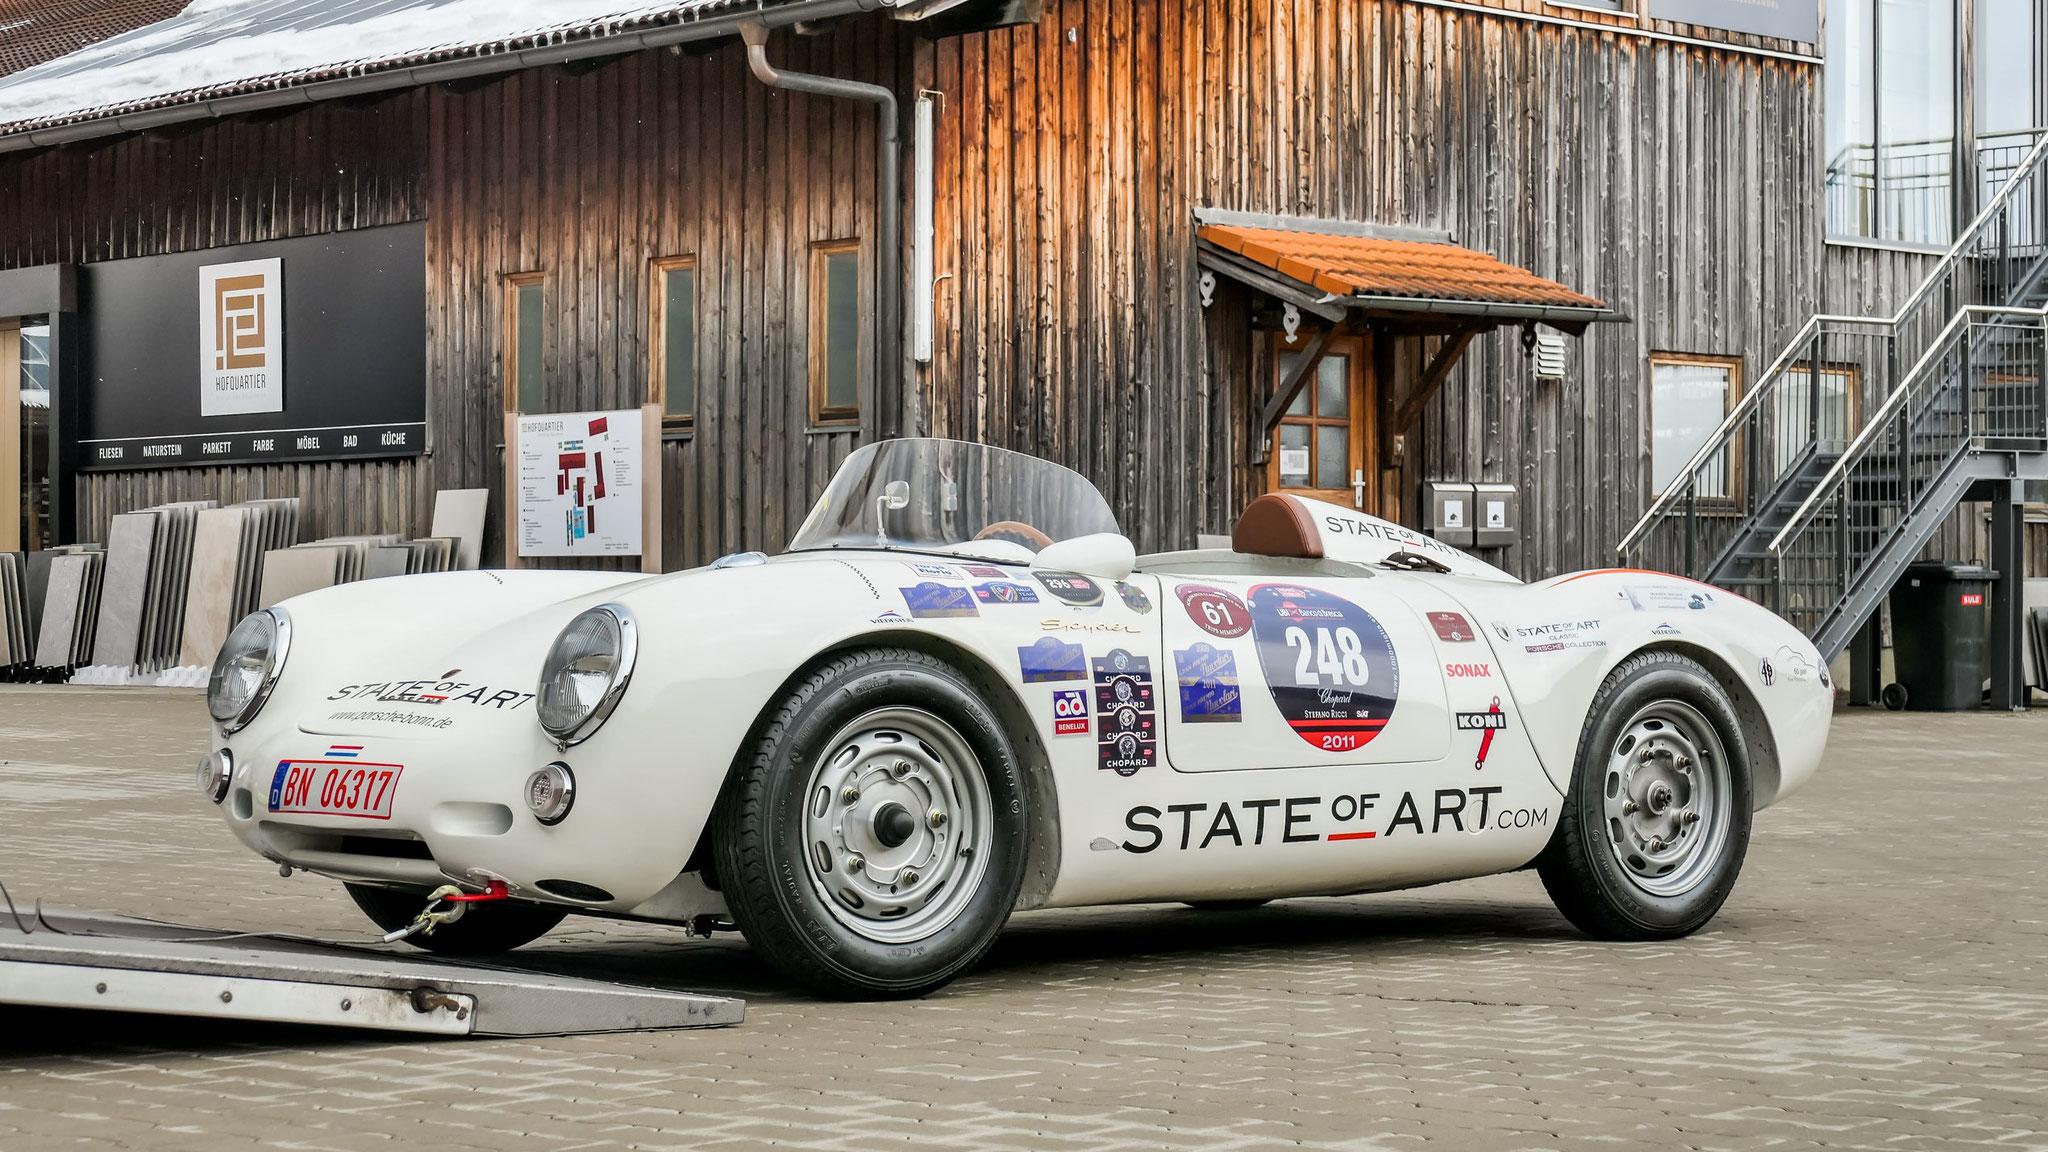 Porsche 550 Spyder - BN-06317